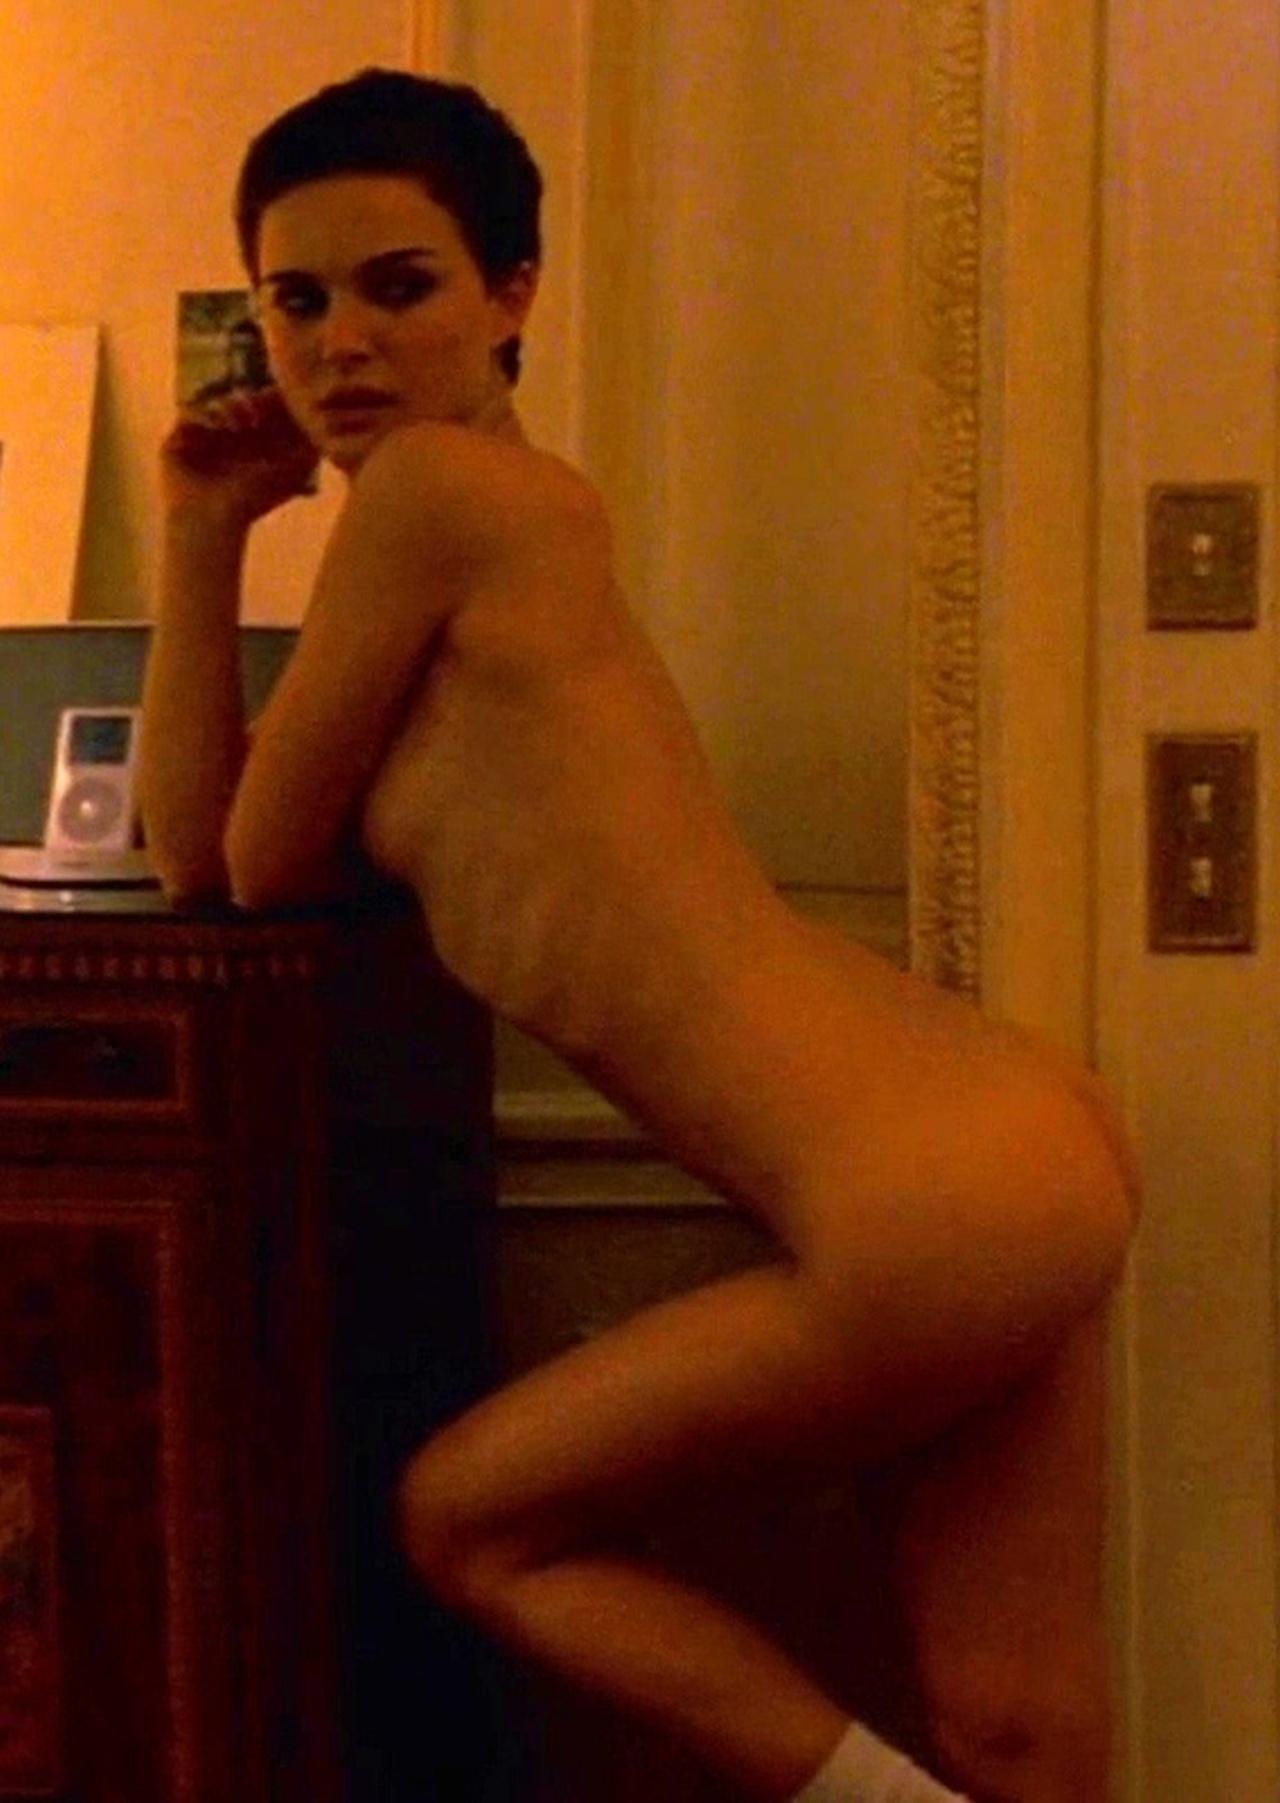 Natalie-Portman-Naked-01